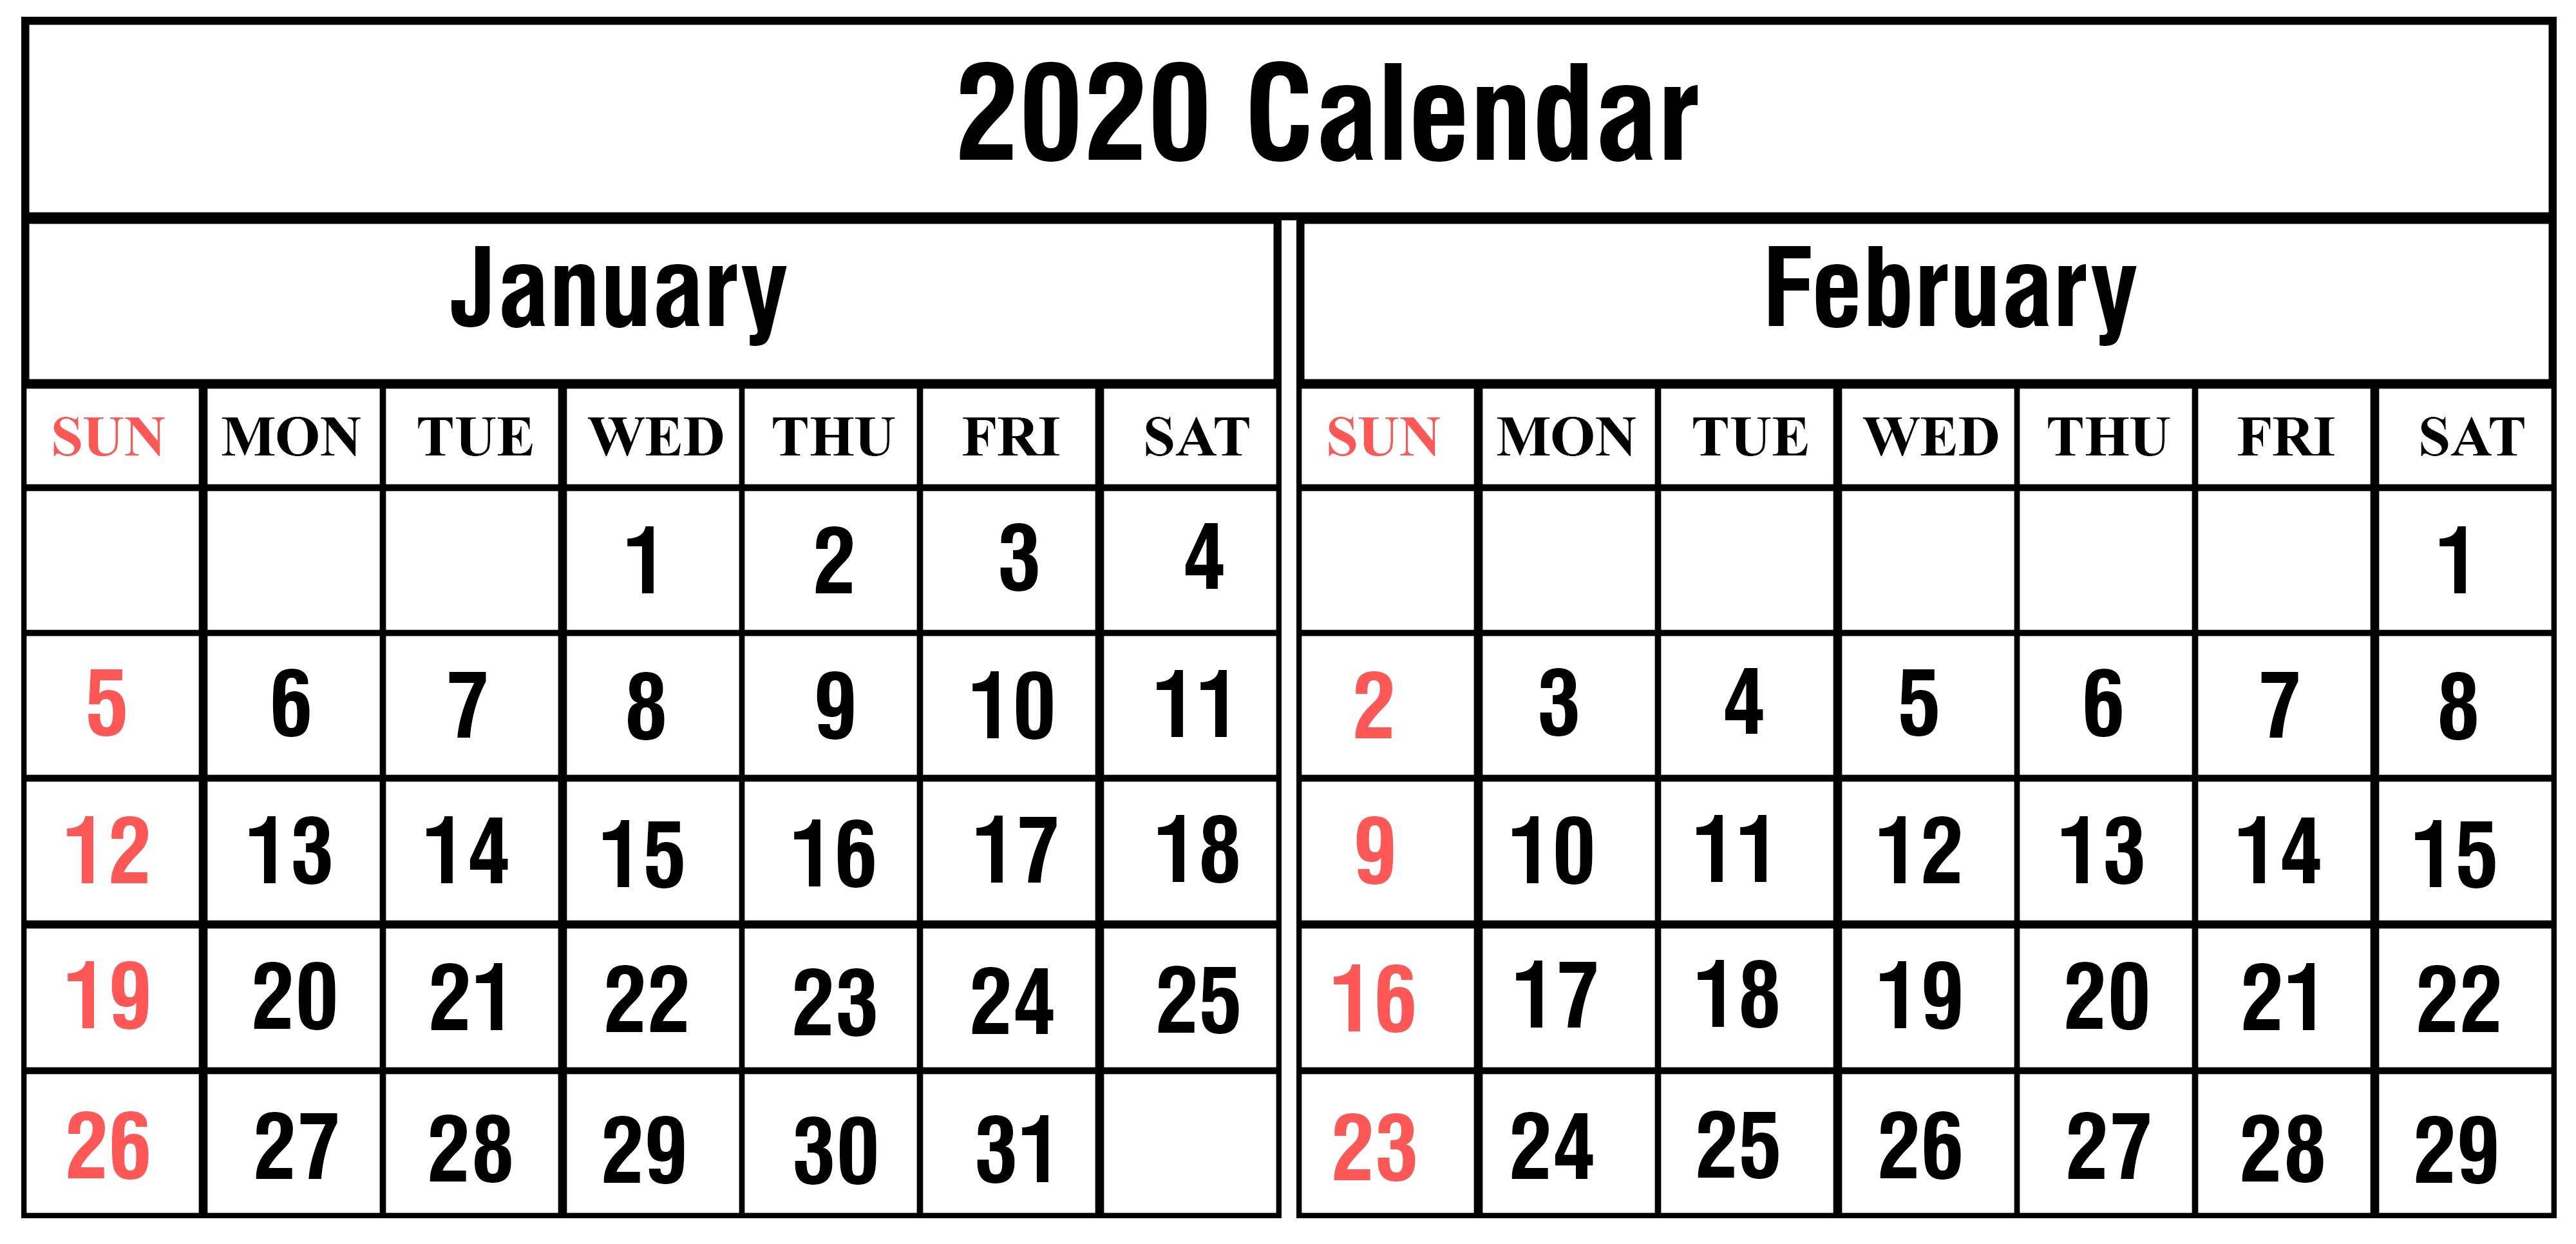 January February 2020 Calendar Printable Template Pdf Word-January Feb 2020 Calendar